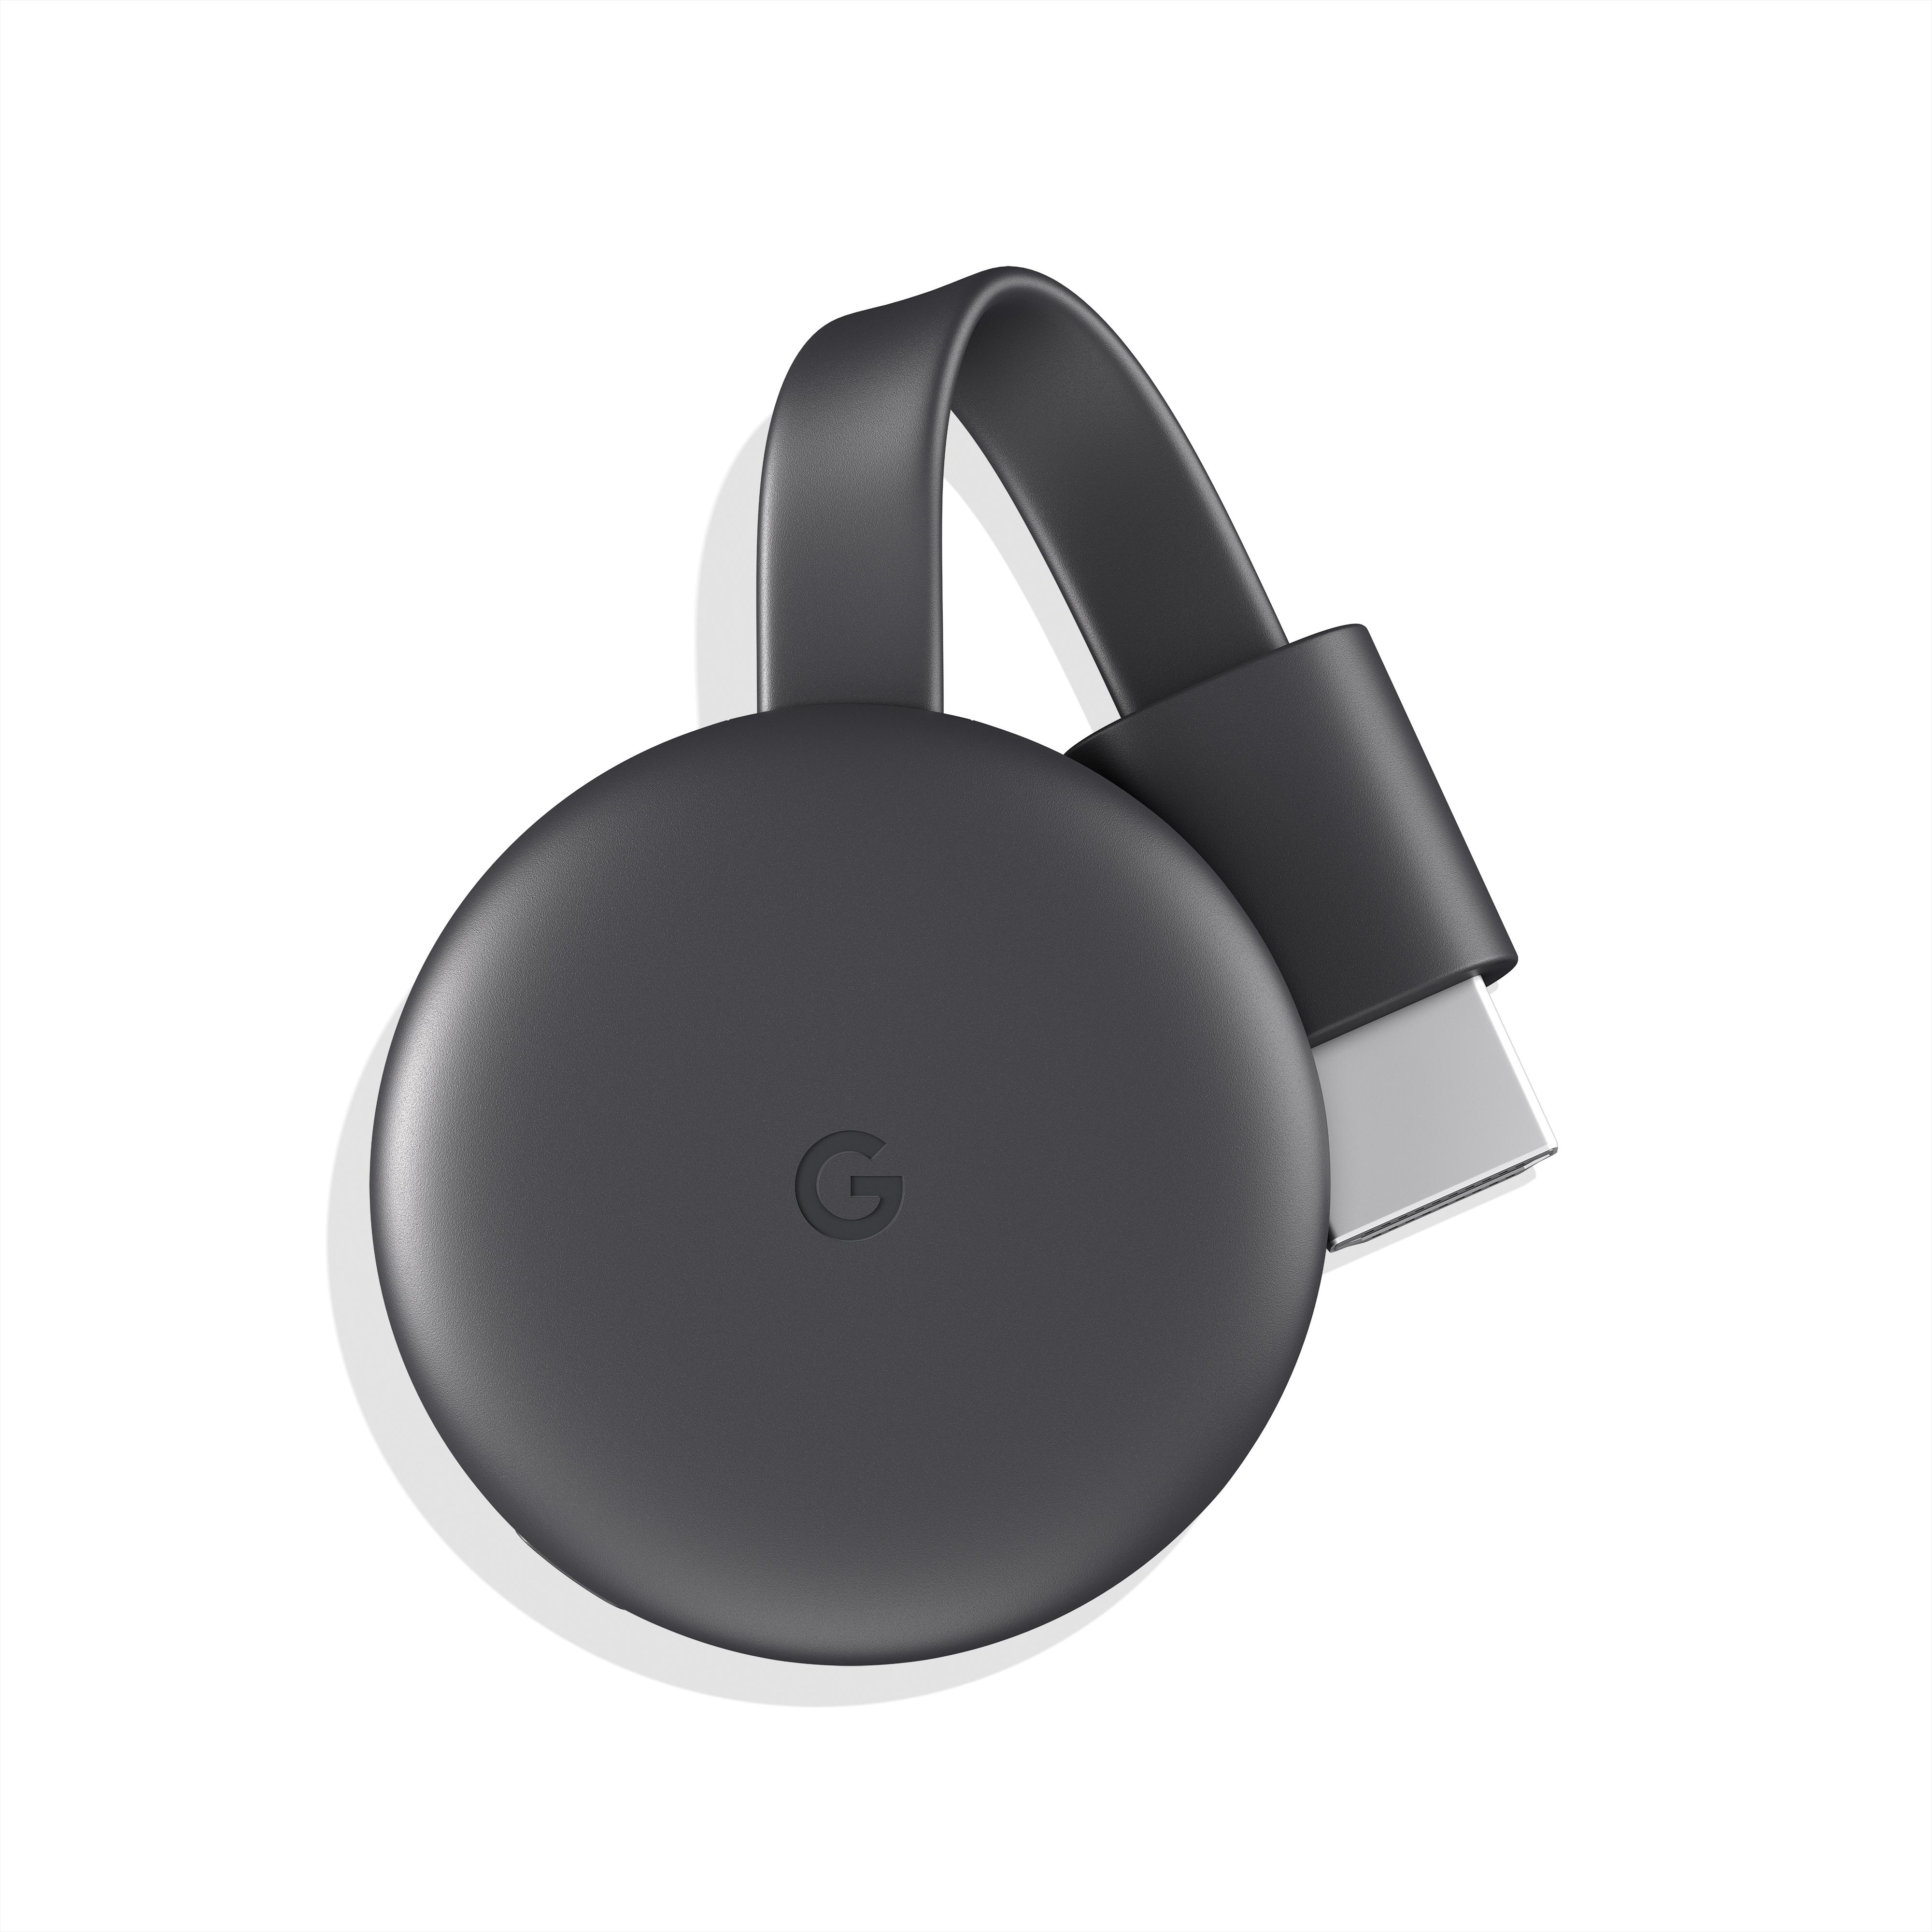 Google Chromecast 3rd Gen $9 in Walmart Neighborhood Market only. YMMV B&M